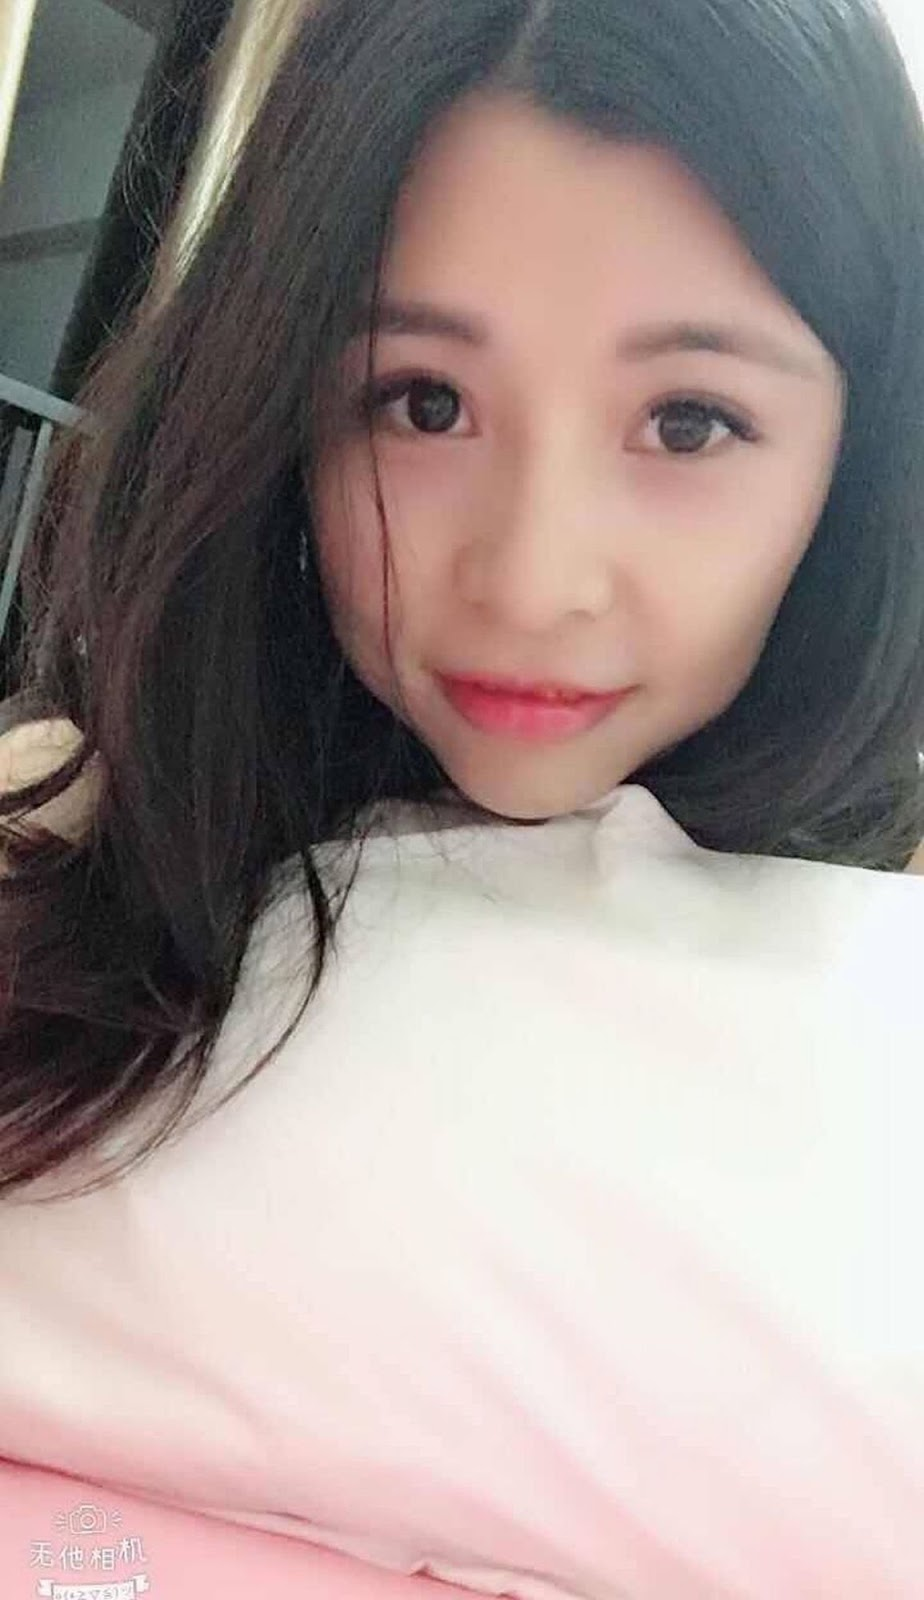 aHR0cHM6Ly93d3cubXlteXBpYy5uZXQvZGF0YS9hdHRhY2htZW50L2ZvcnVtLzIwMTkwOC8yMC8wODM0NTB2c2gzcWh6ajlxamRnOWh6LmpwZy50aHVtYi5qcGc%253D - 成都瓶儿 - Chengdu Pinger big tits selfie nude 2020